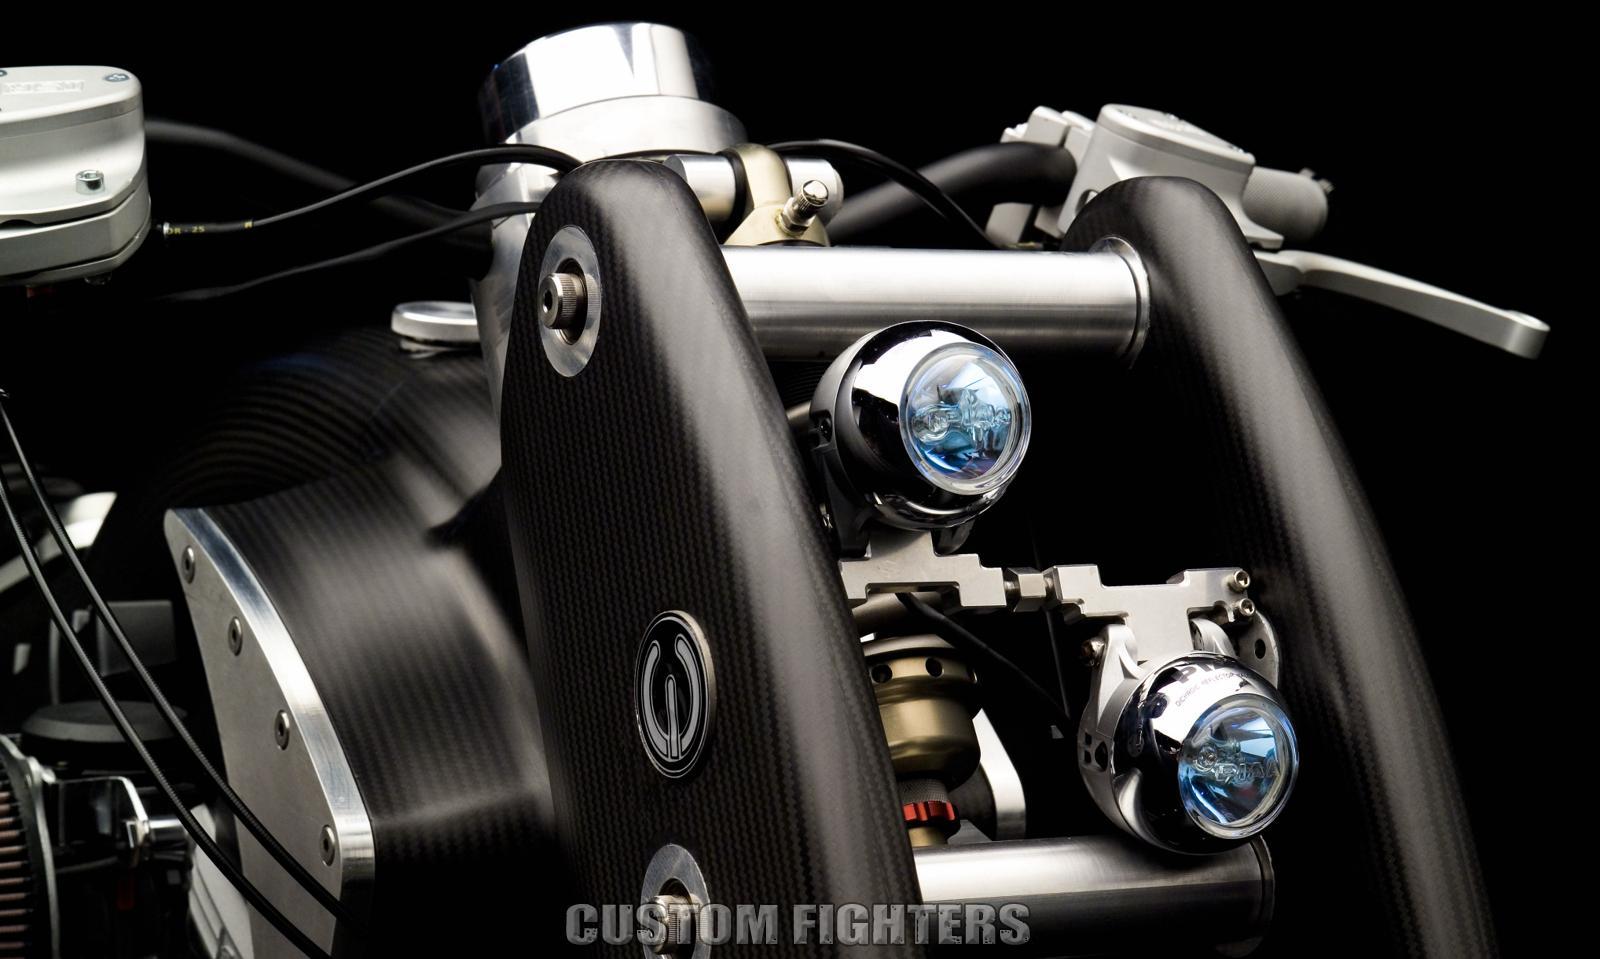 headlight assembly - Custom Fighters - Custom Streetfighter ... for Motorcycle Headlight Design  1lp1fsj